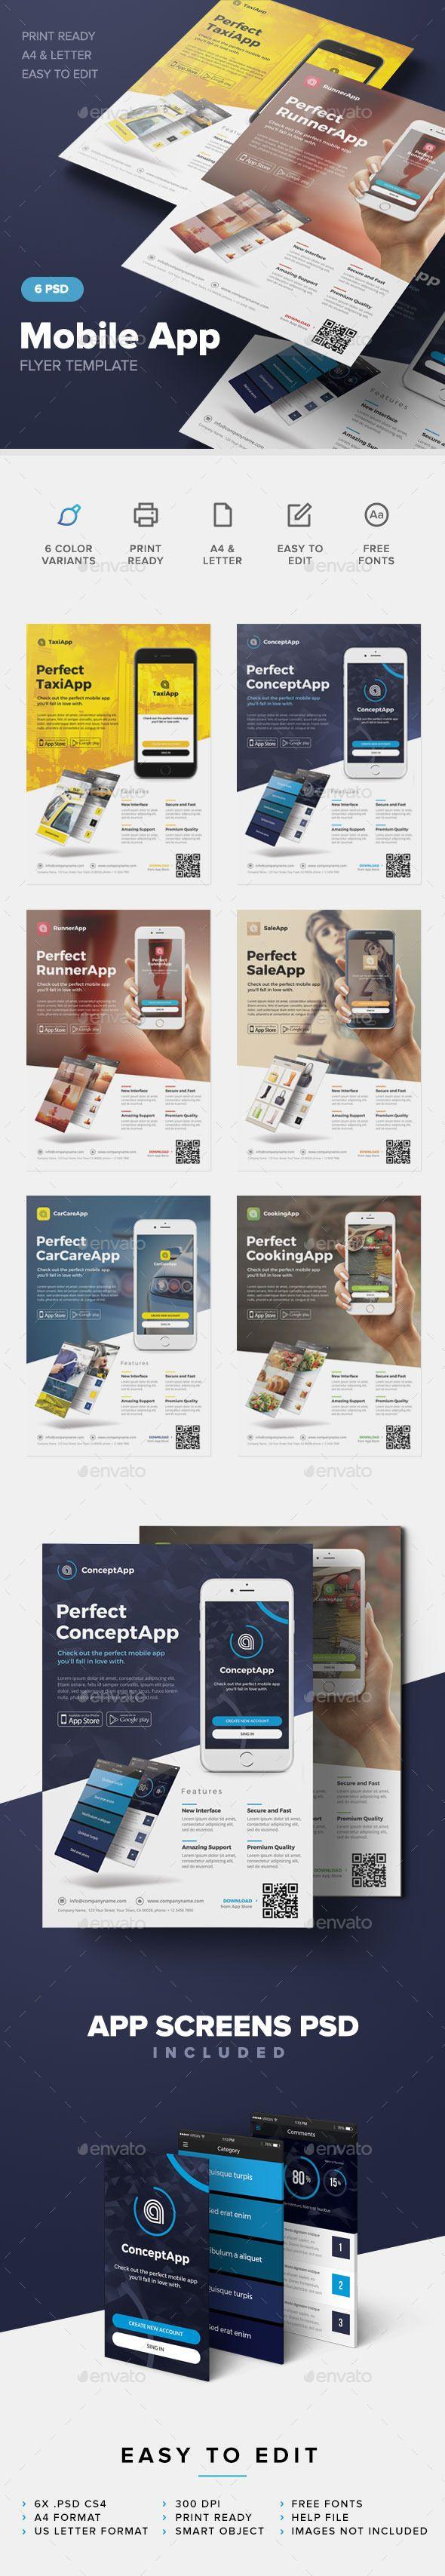 Mobile App Flyer Template Design Download Httpgraphicriver